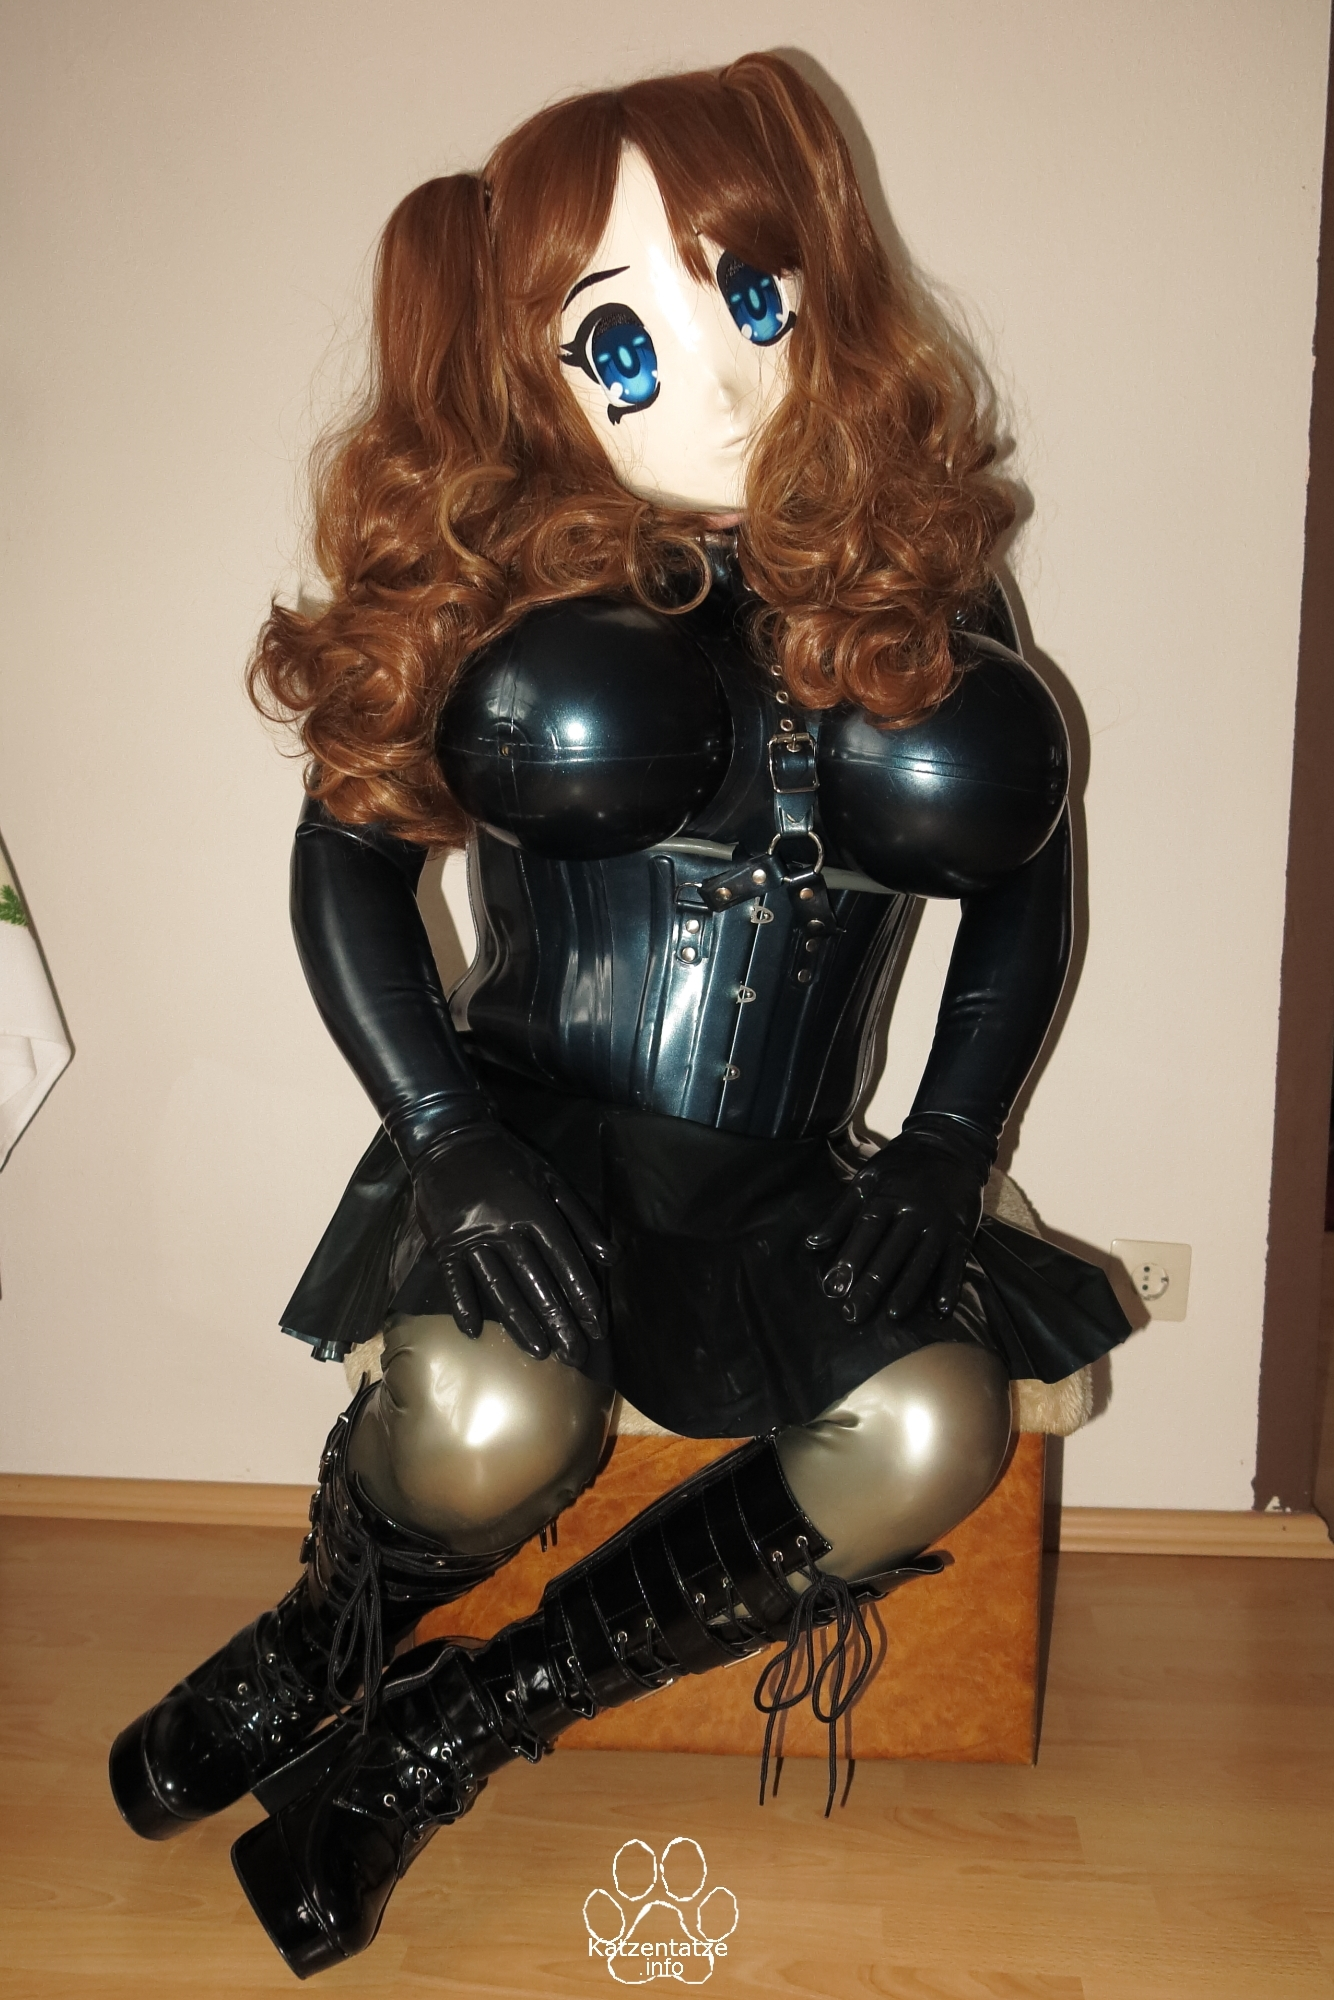 Asuka as rubber maid